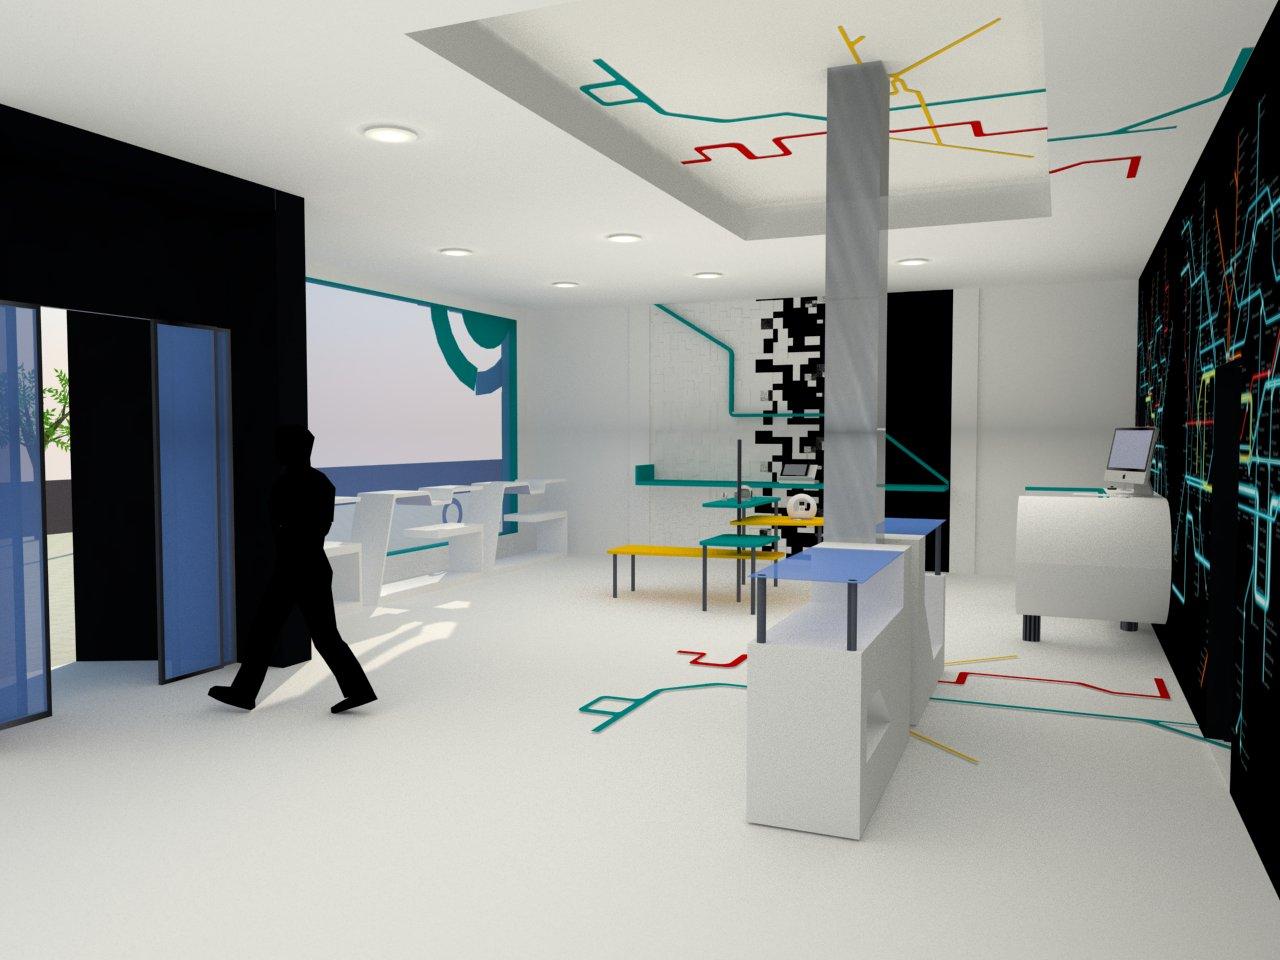 dise o de interiores escuela de arte de motril proyecto